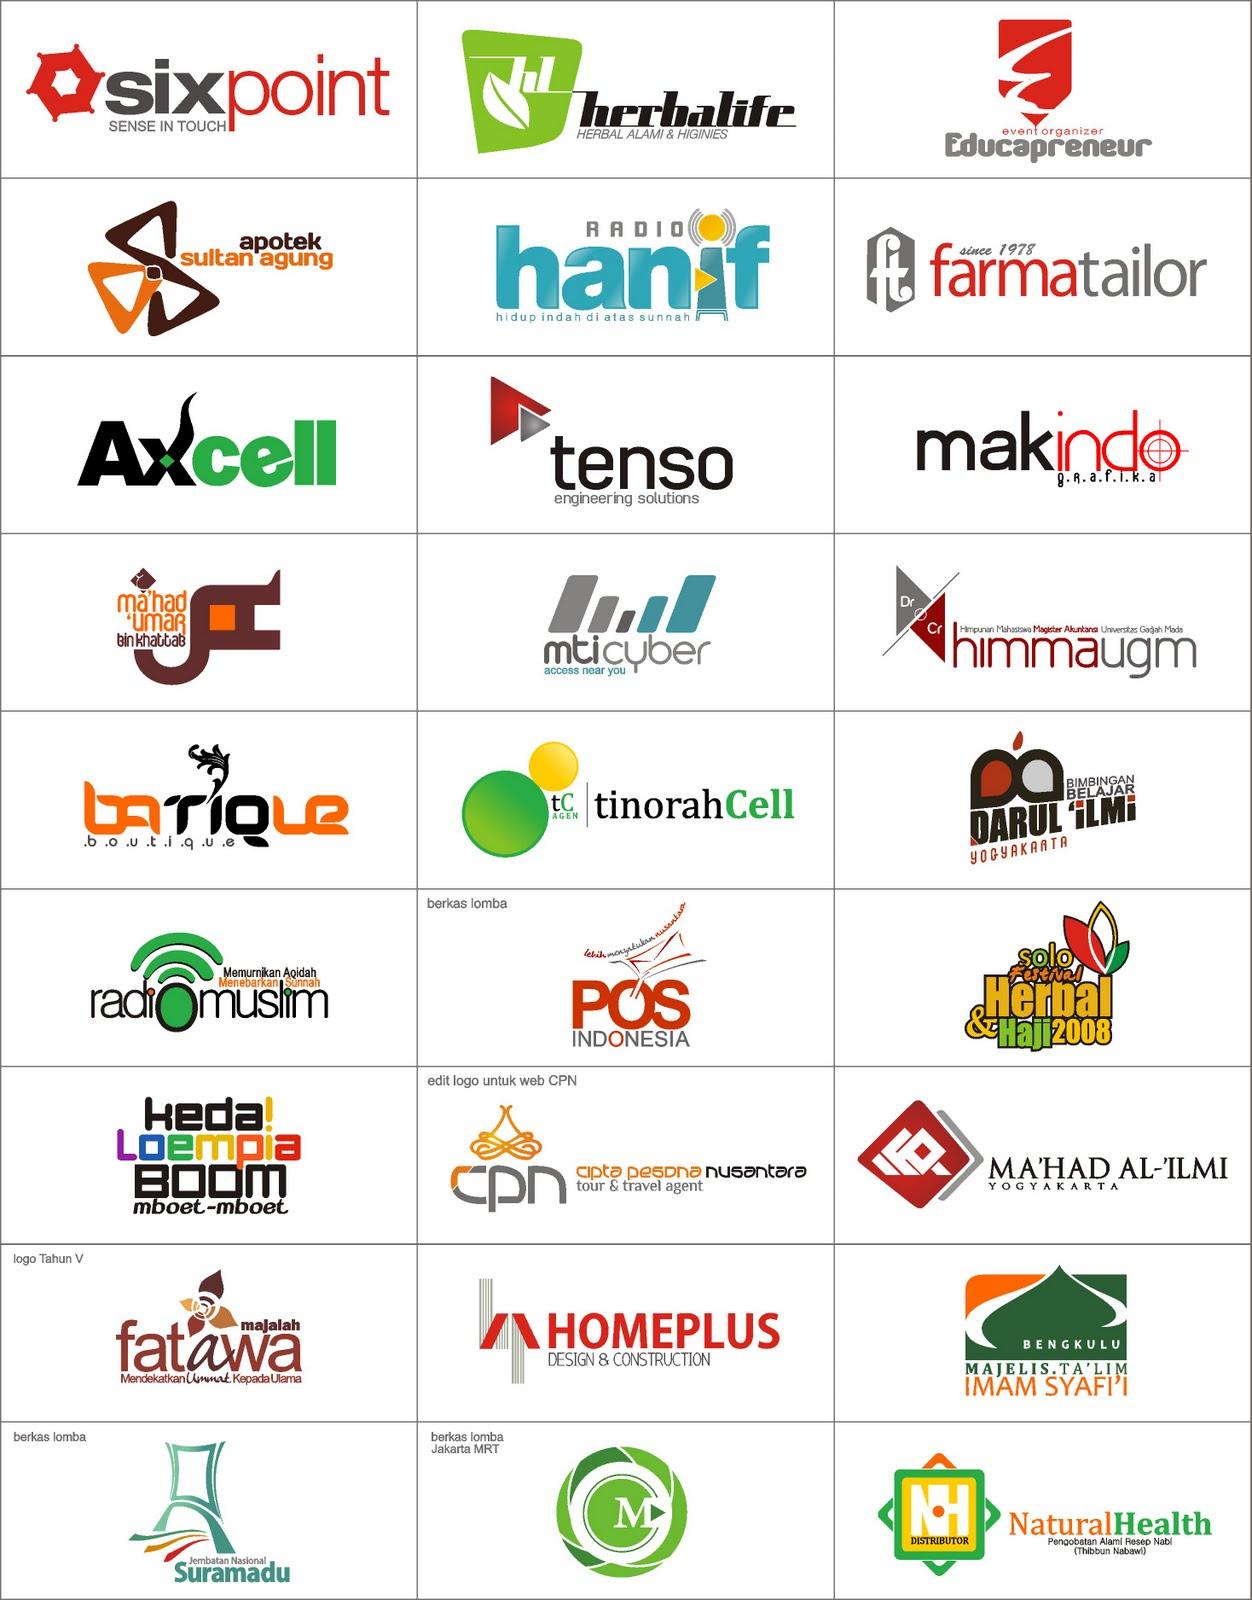 gambar gambar logo quis ~ November, 2014 from modapkdownload.net